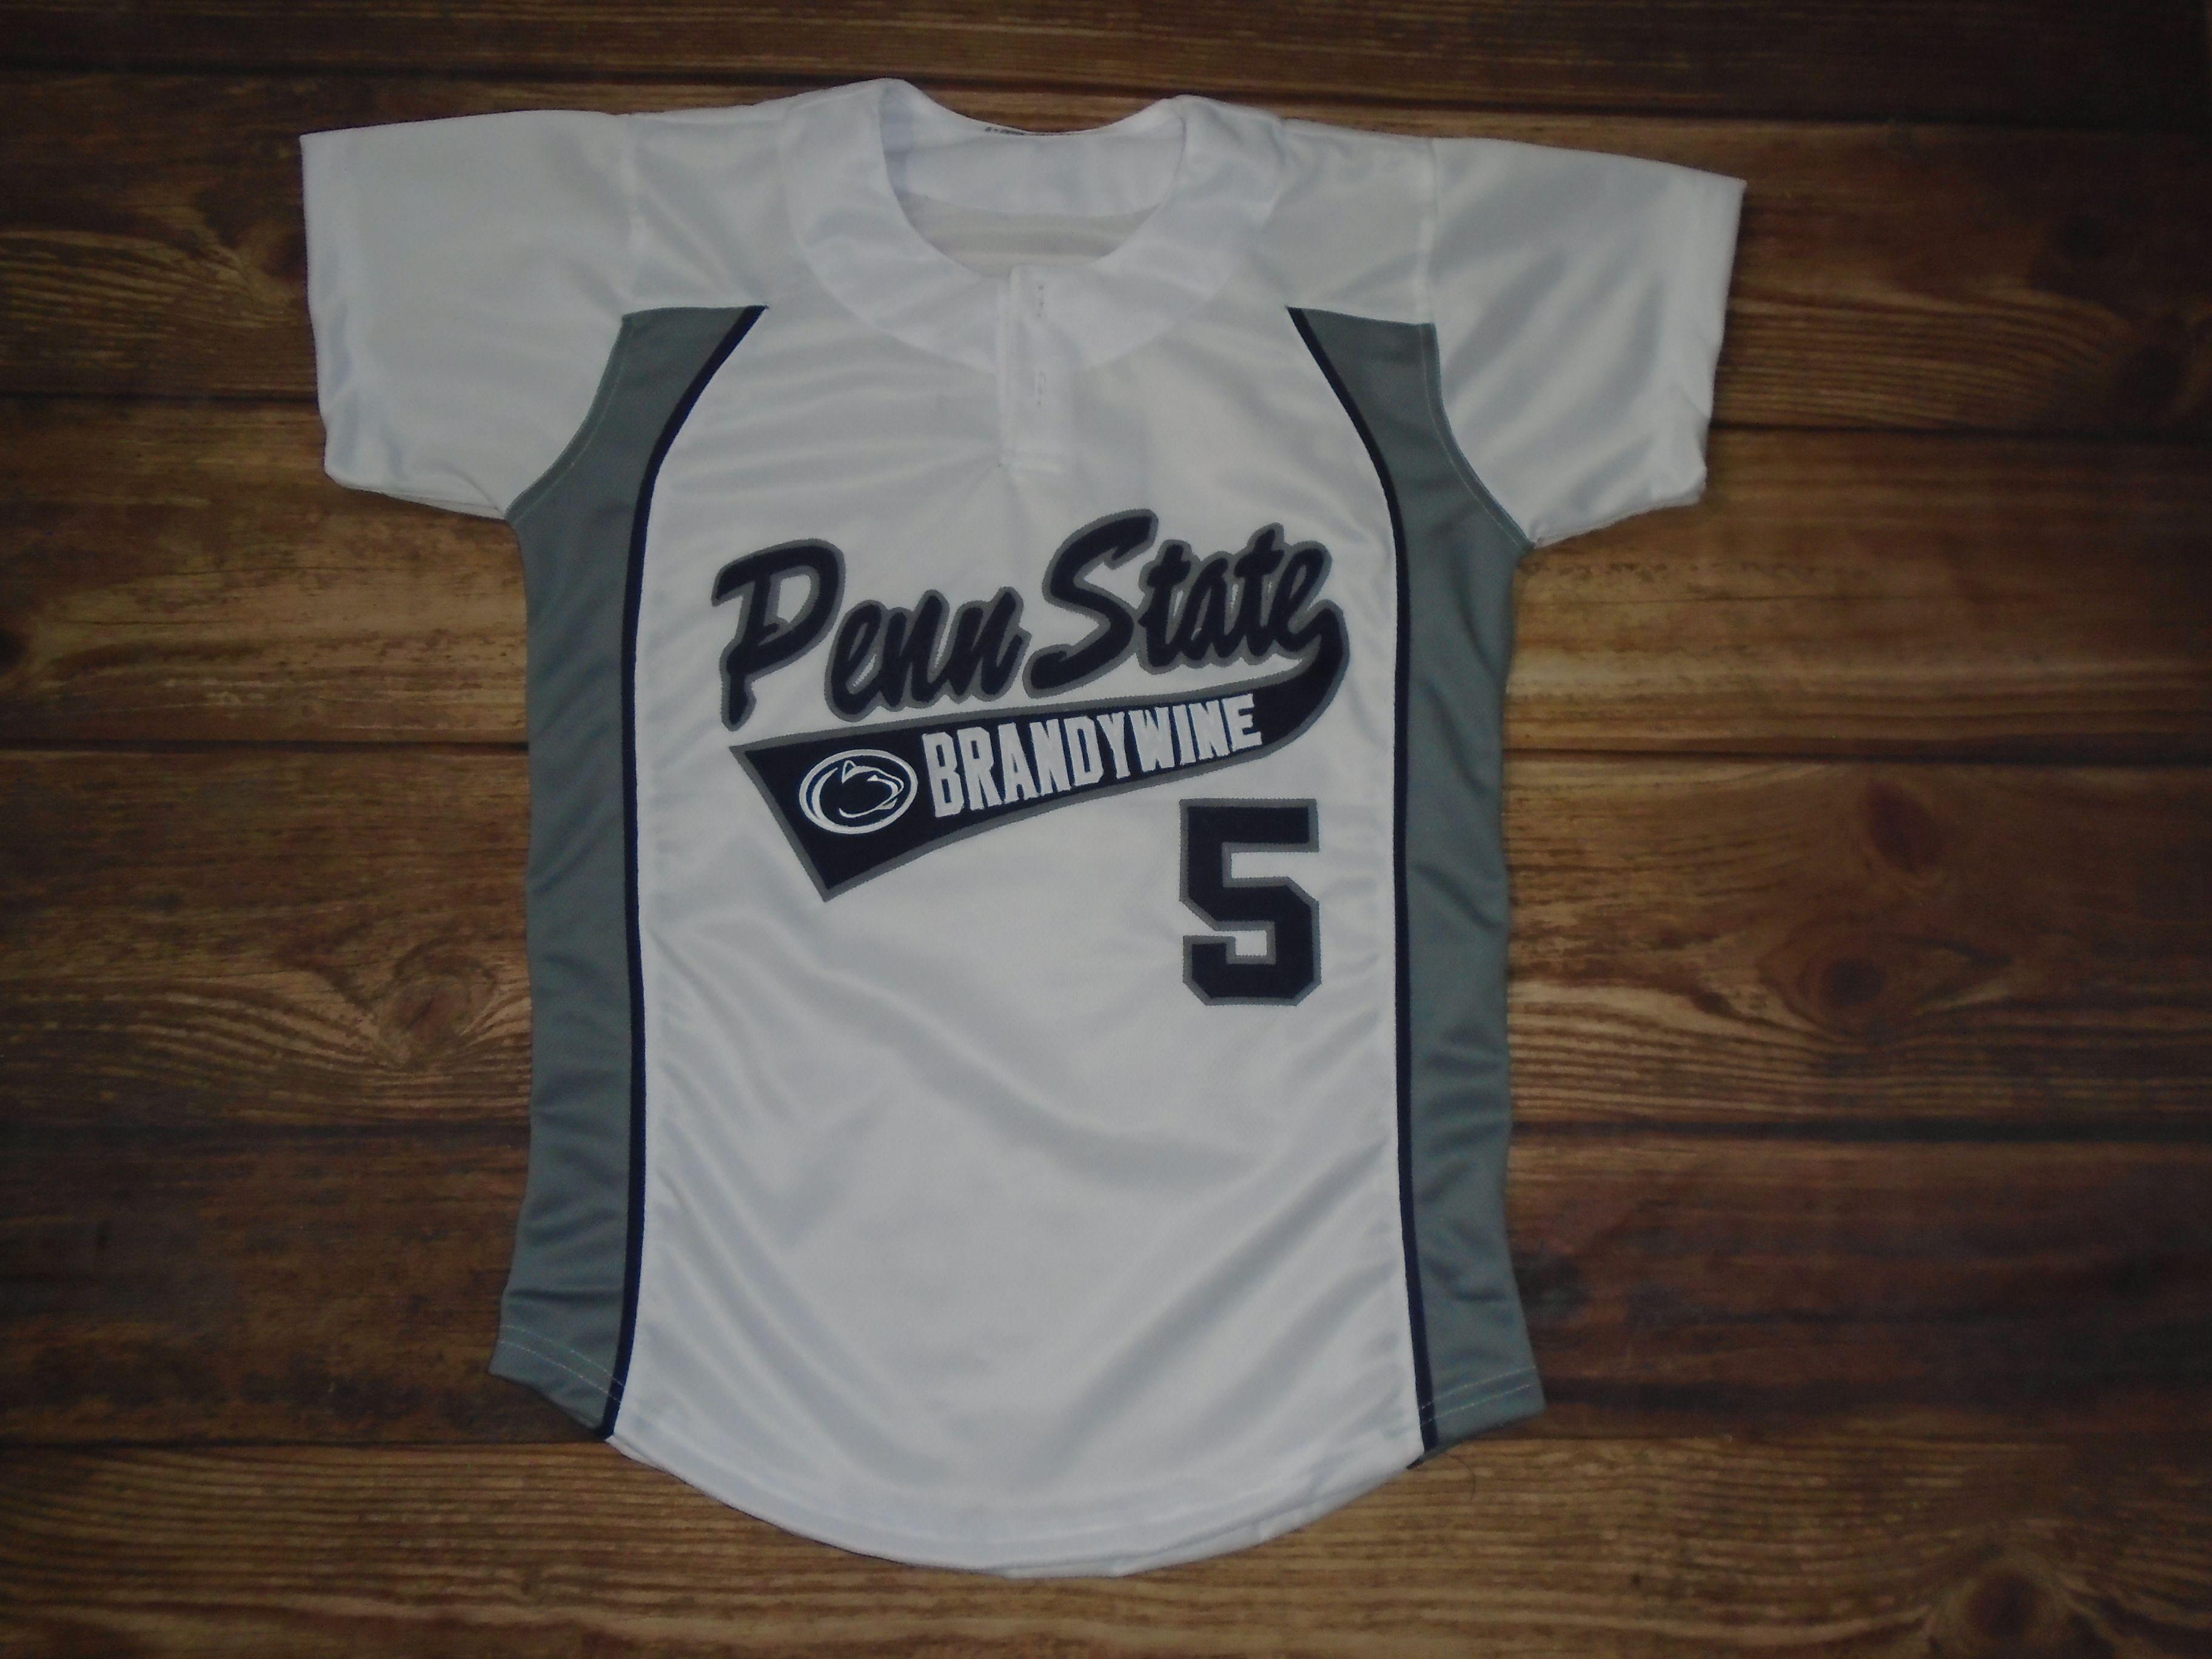 Penn State Brandywine Softball Designed These Custom Jerseys And C M Sporting Goods In Havertown Pa Created Them For T Custom Uniform Custom Jerseys Mens Tops